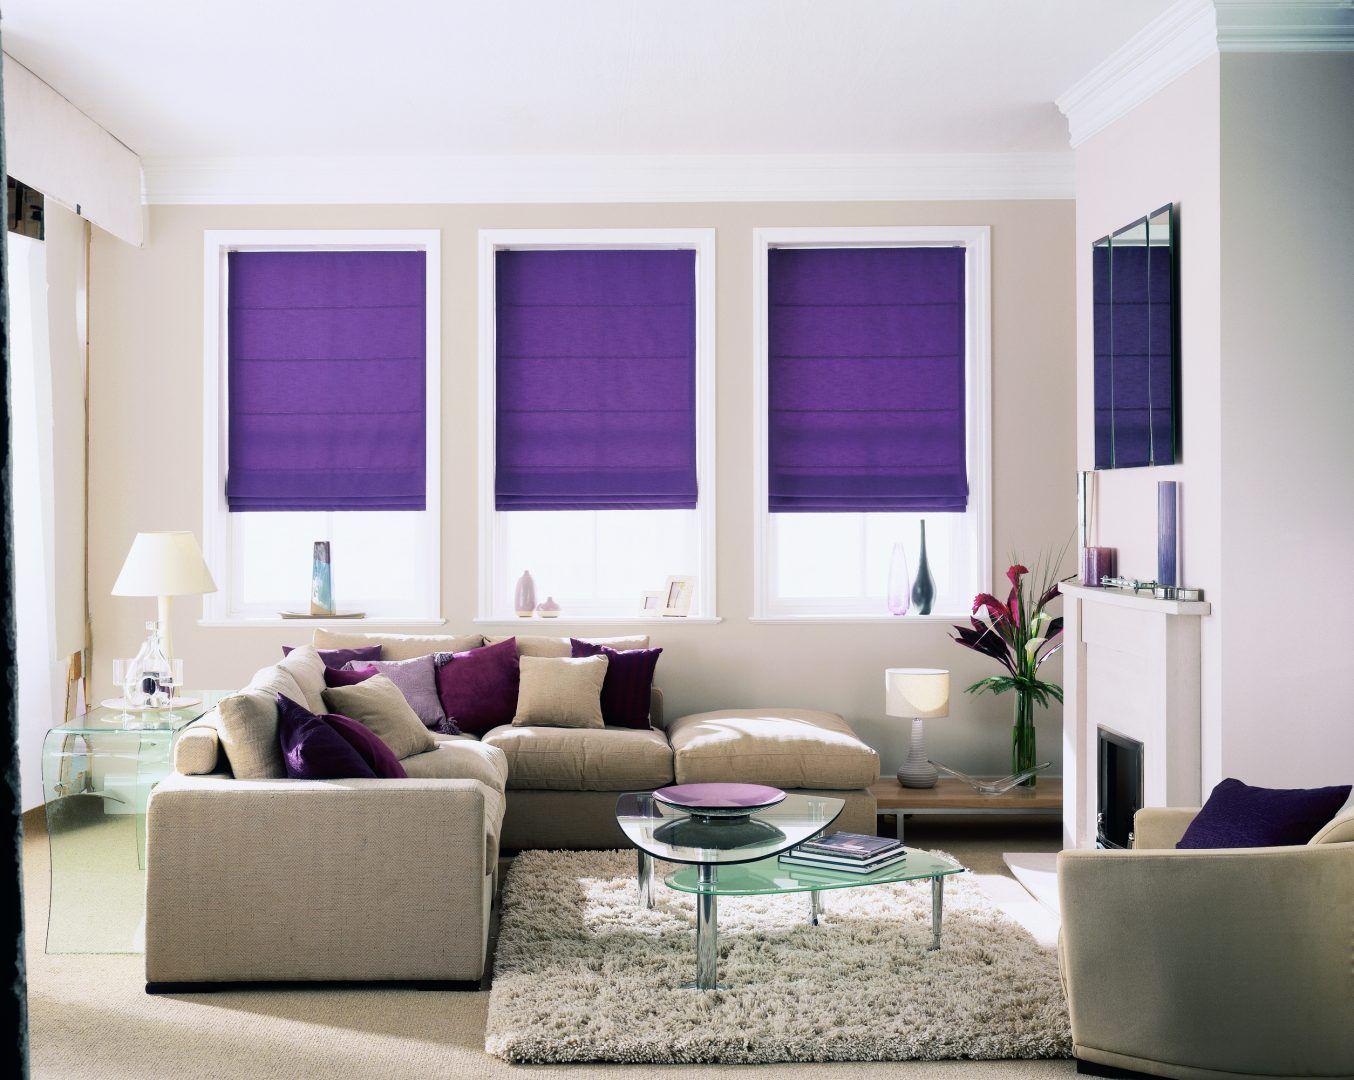 cortinas de estores para salon - Buscar con Google